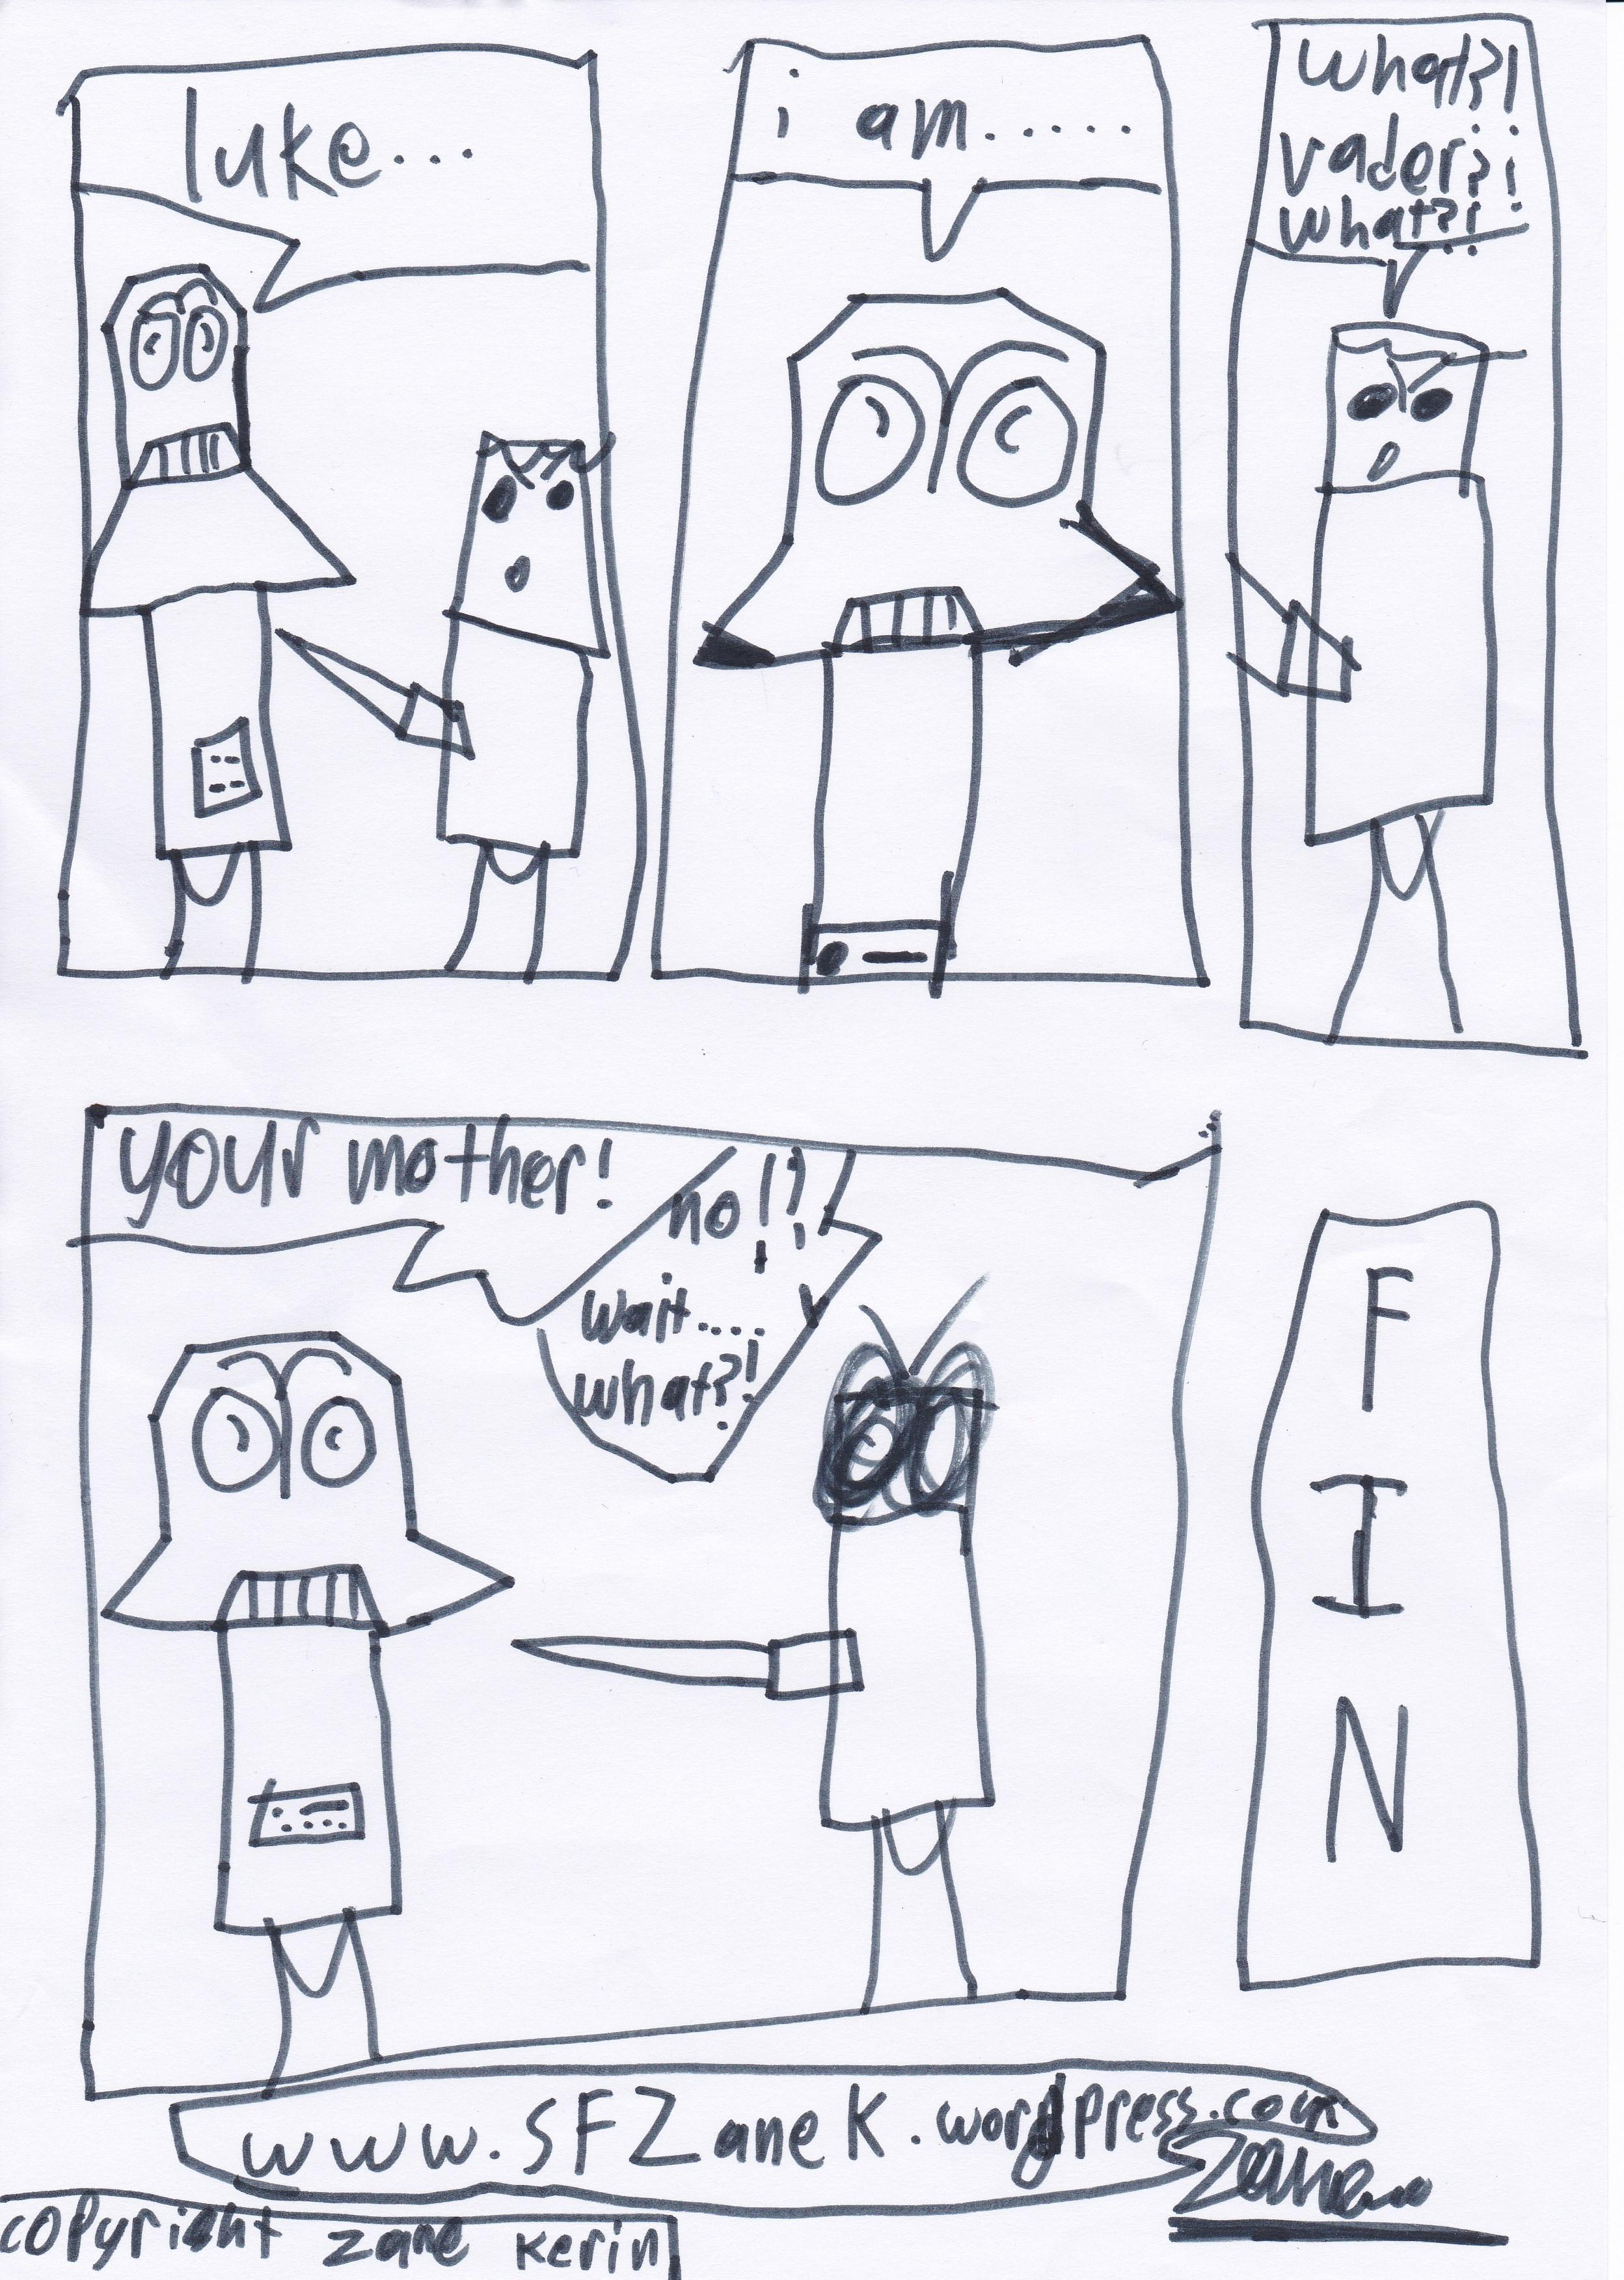 OrigamiYoda | Page 93 - photo#24